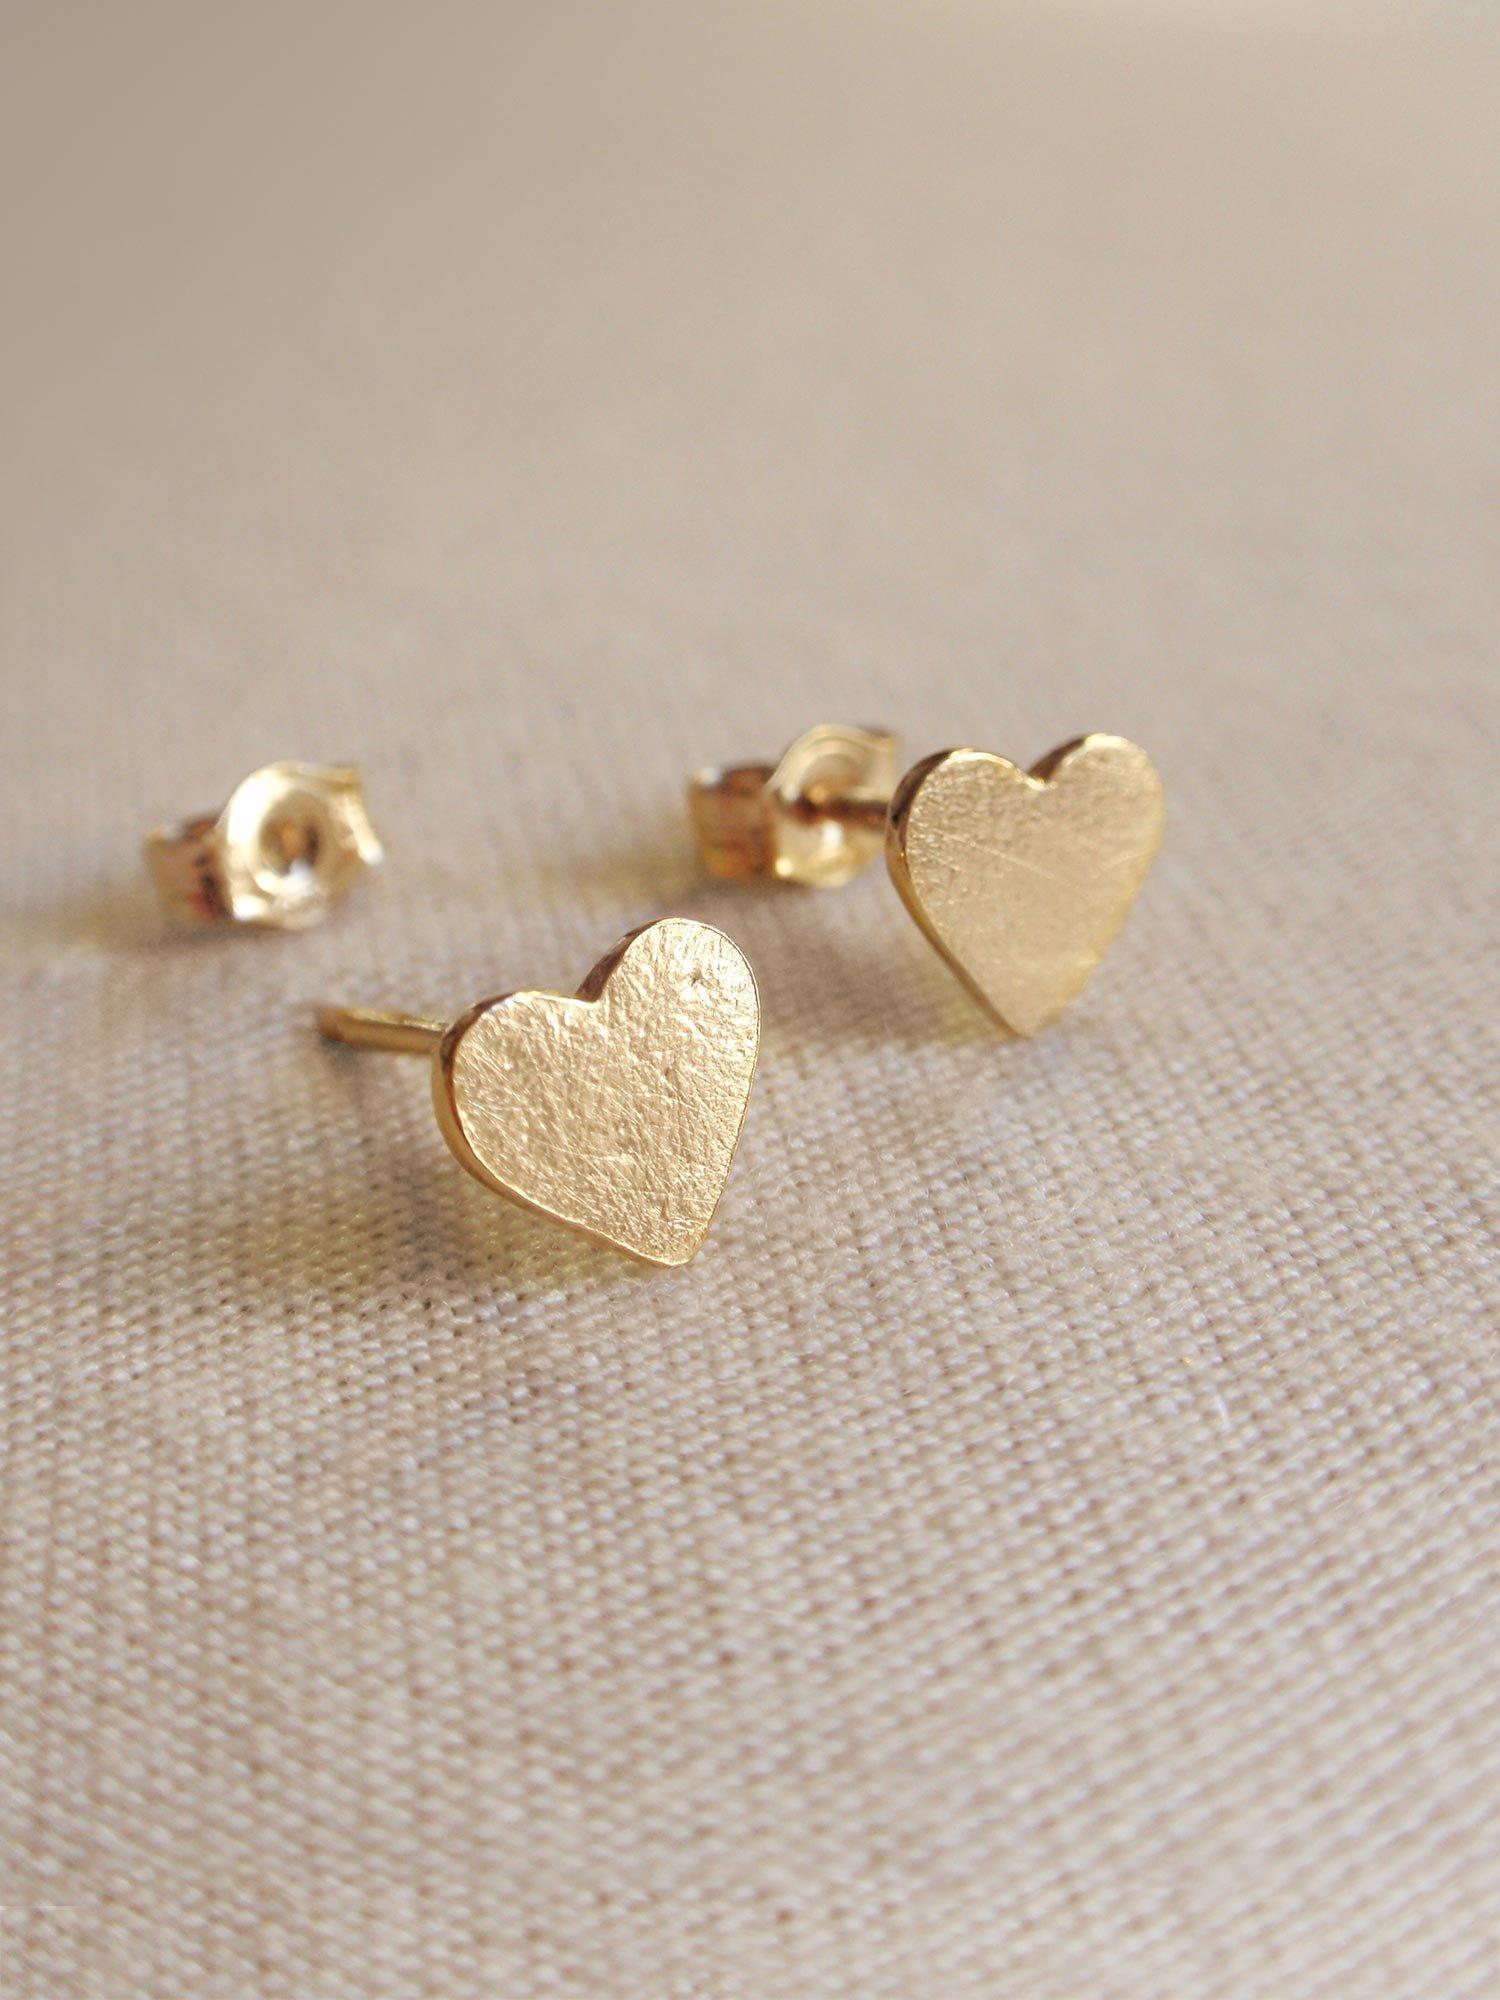 Image of Little Heart Earrings - Golden